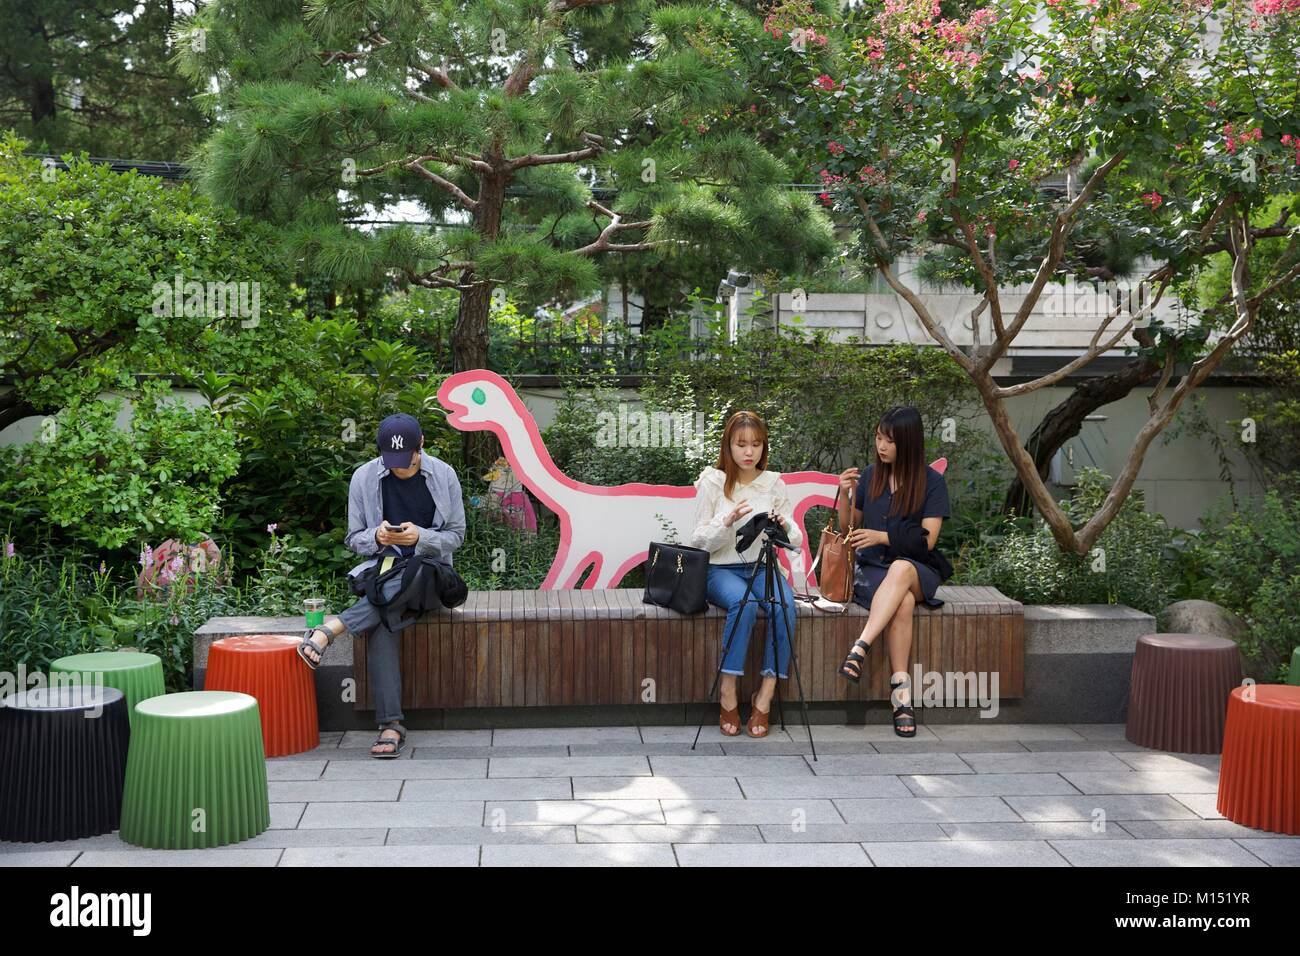 South Korea Seoul Young Man Stock Photos & South Korea Seoul